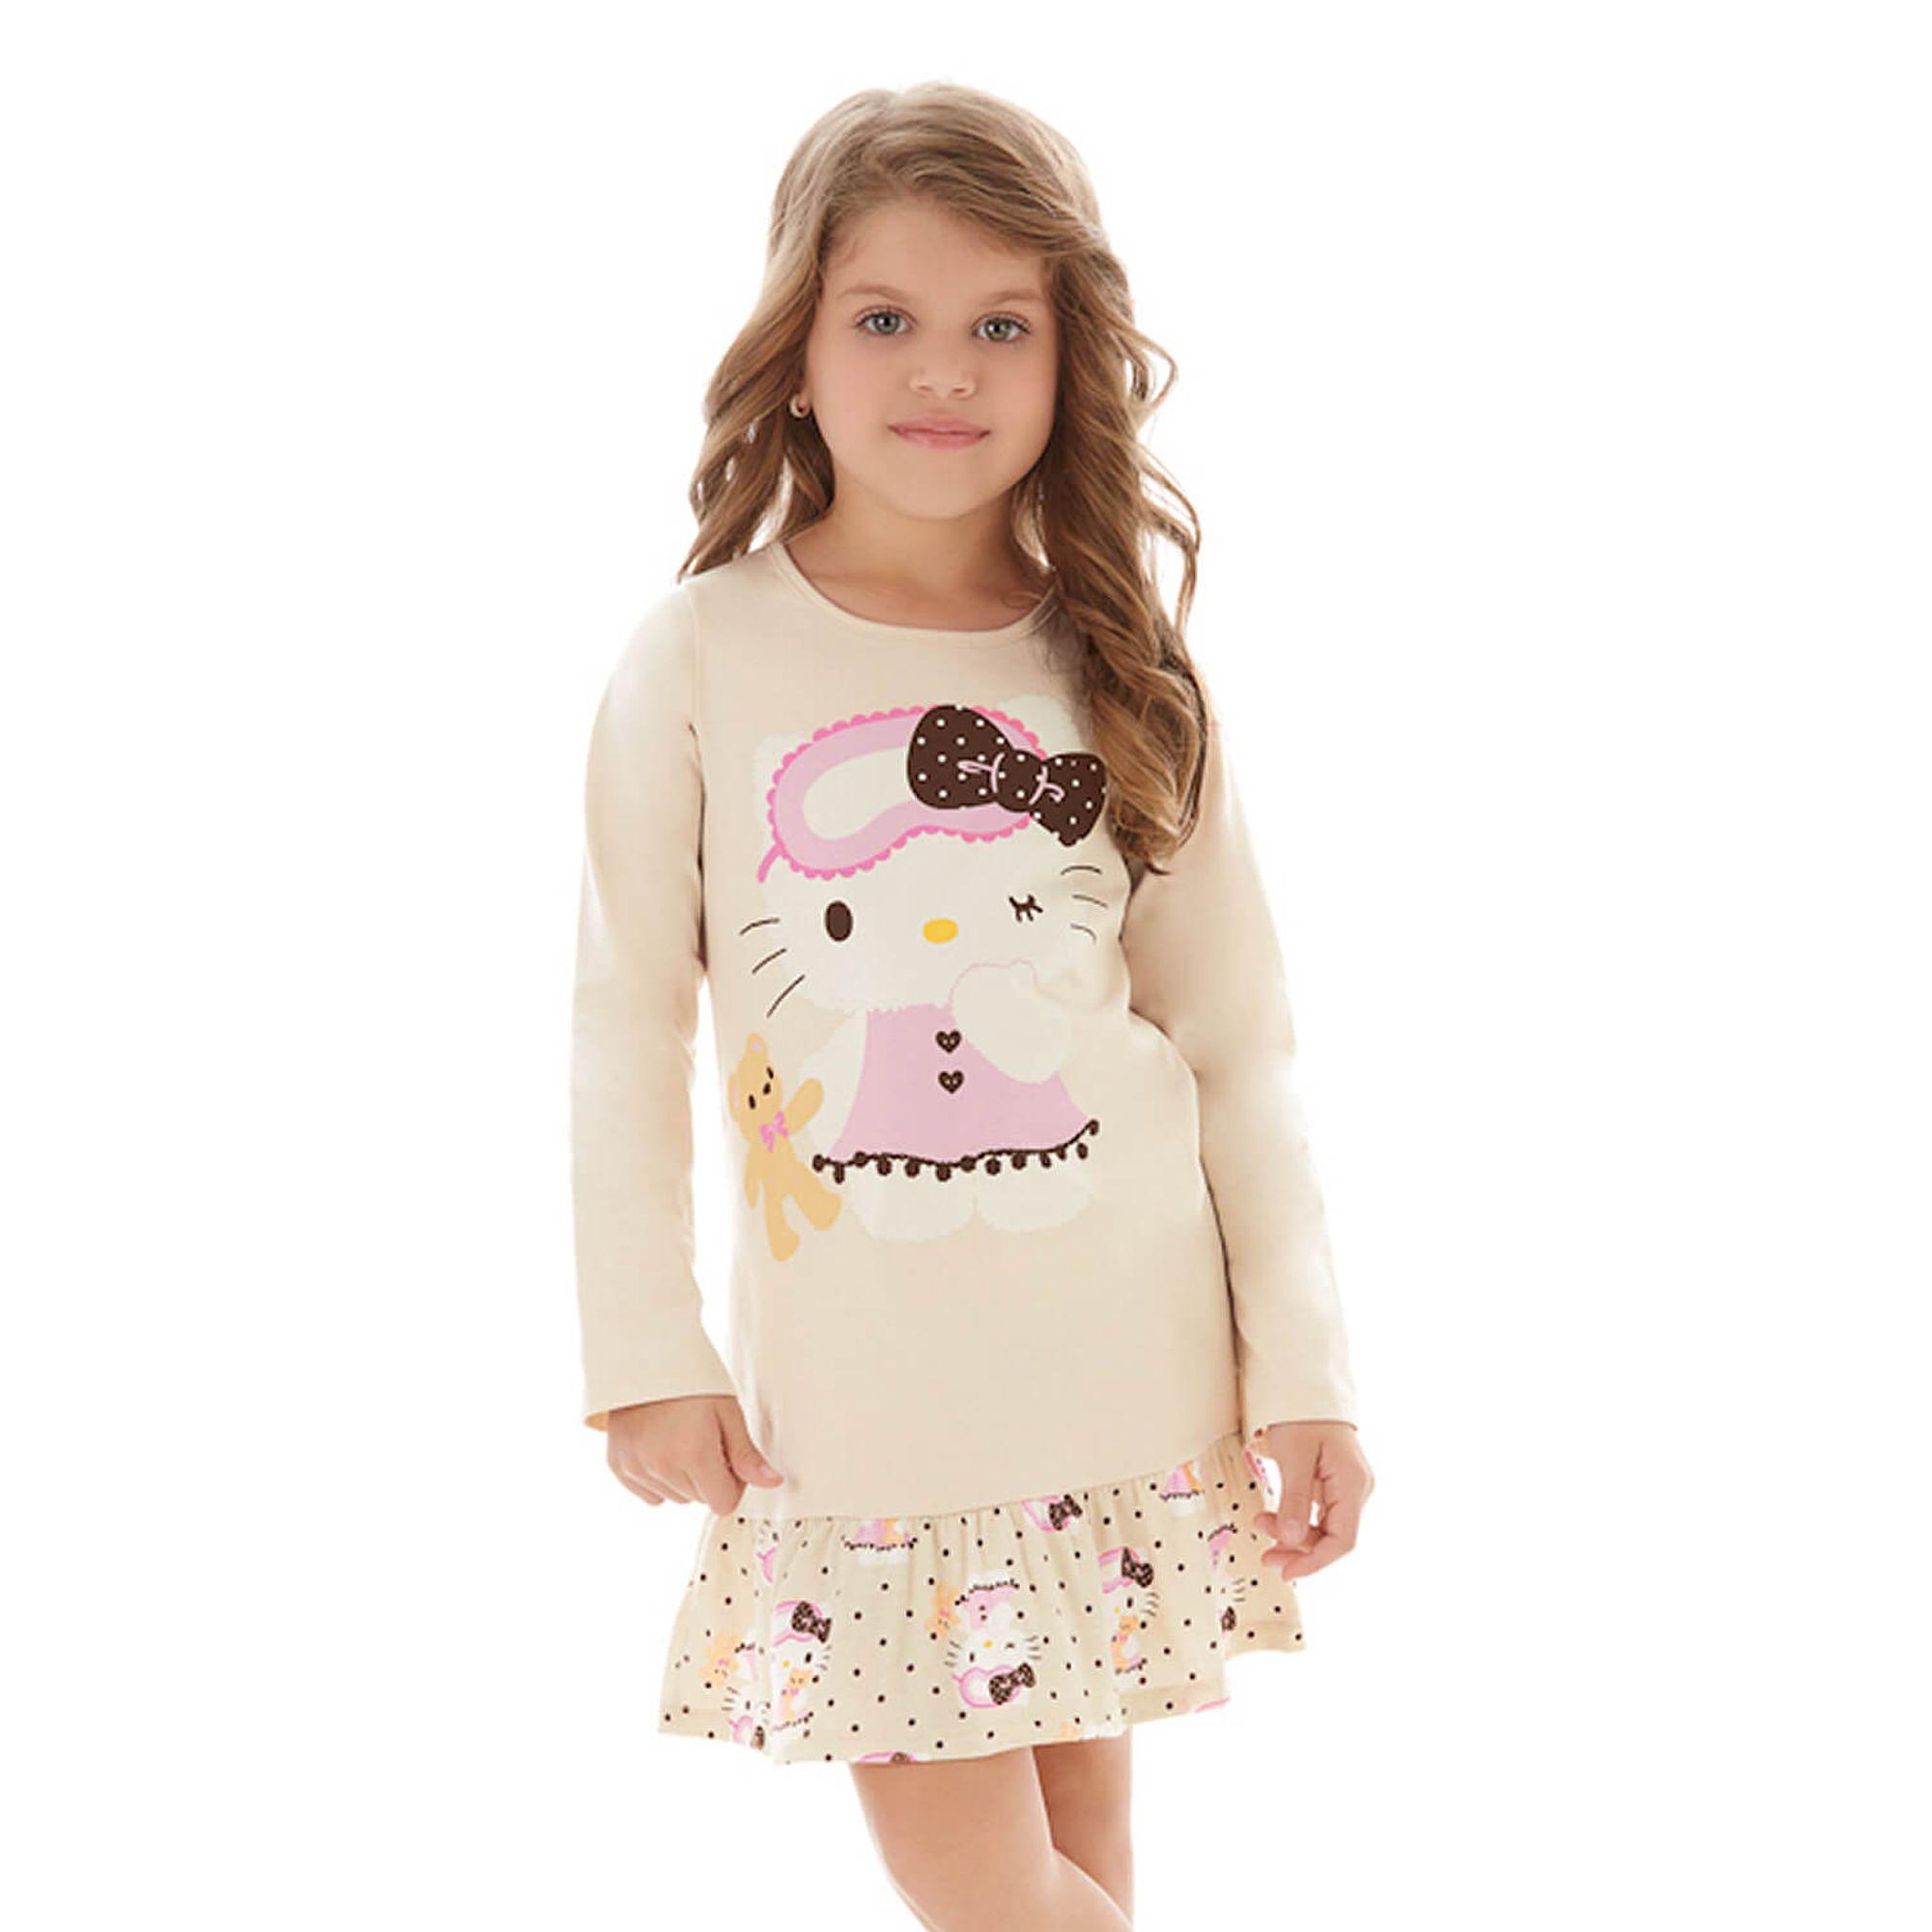 camisola-infantil-hello-kitty-soneca-com-urso